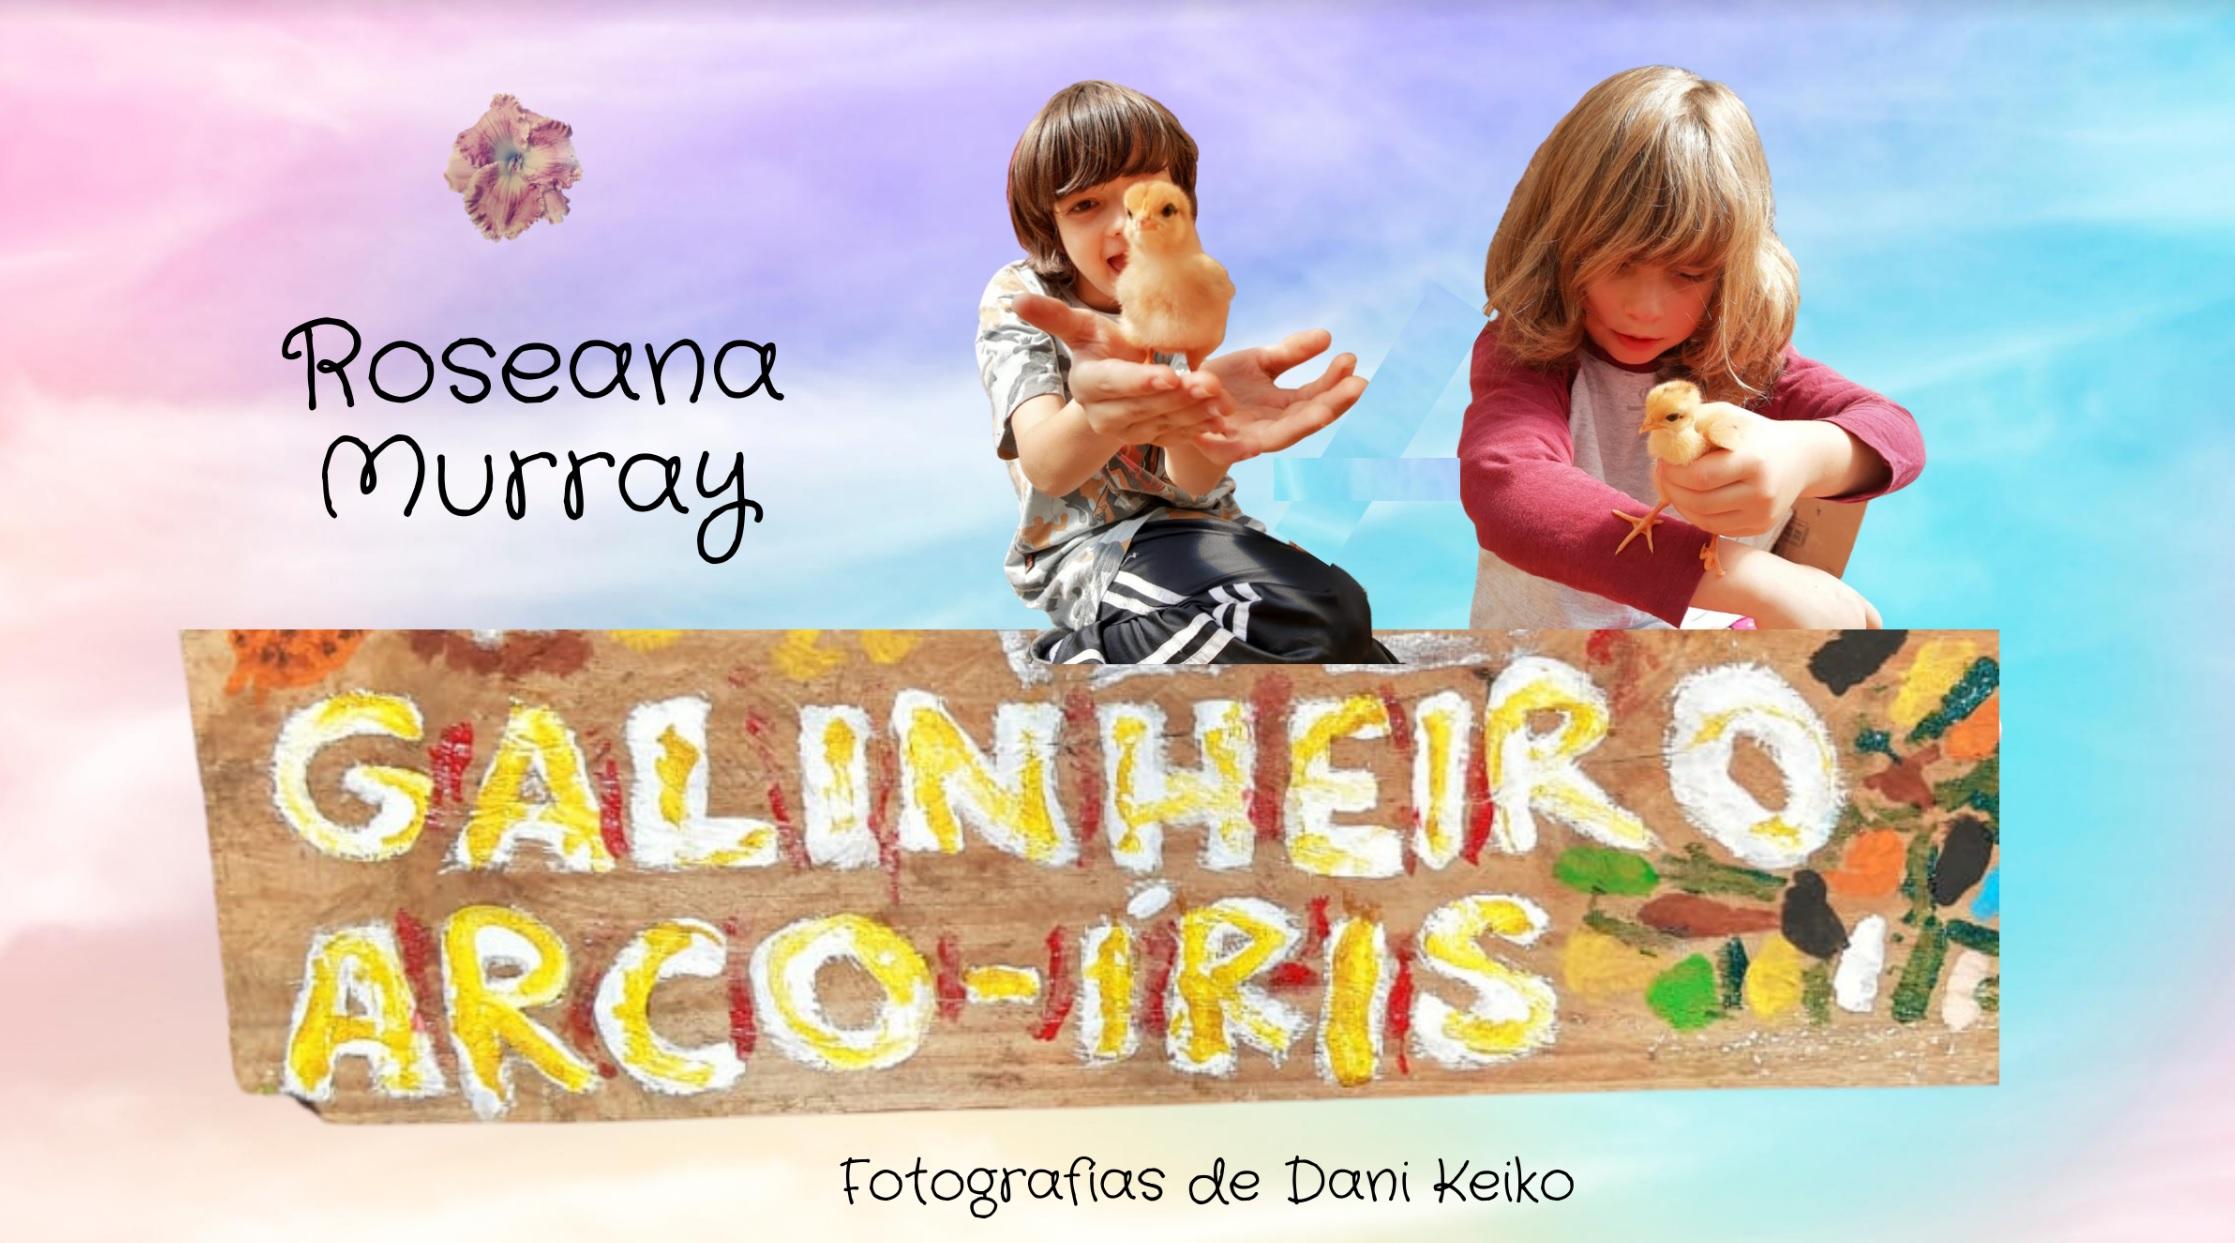 galinheiro-arco-iris-roseana-murray